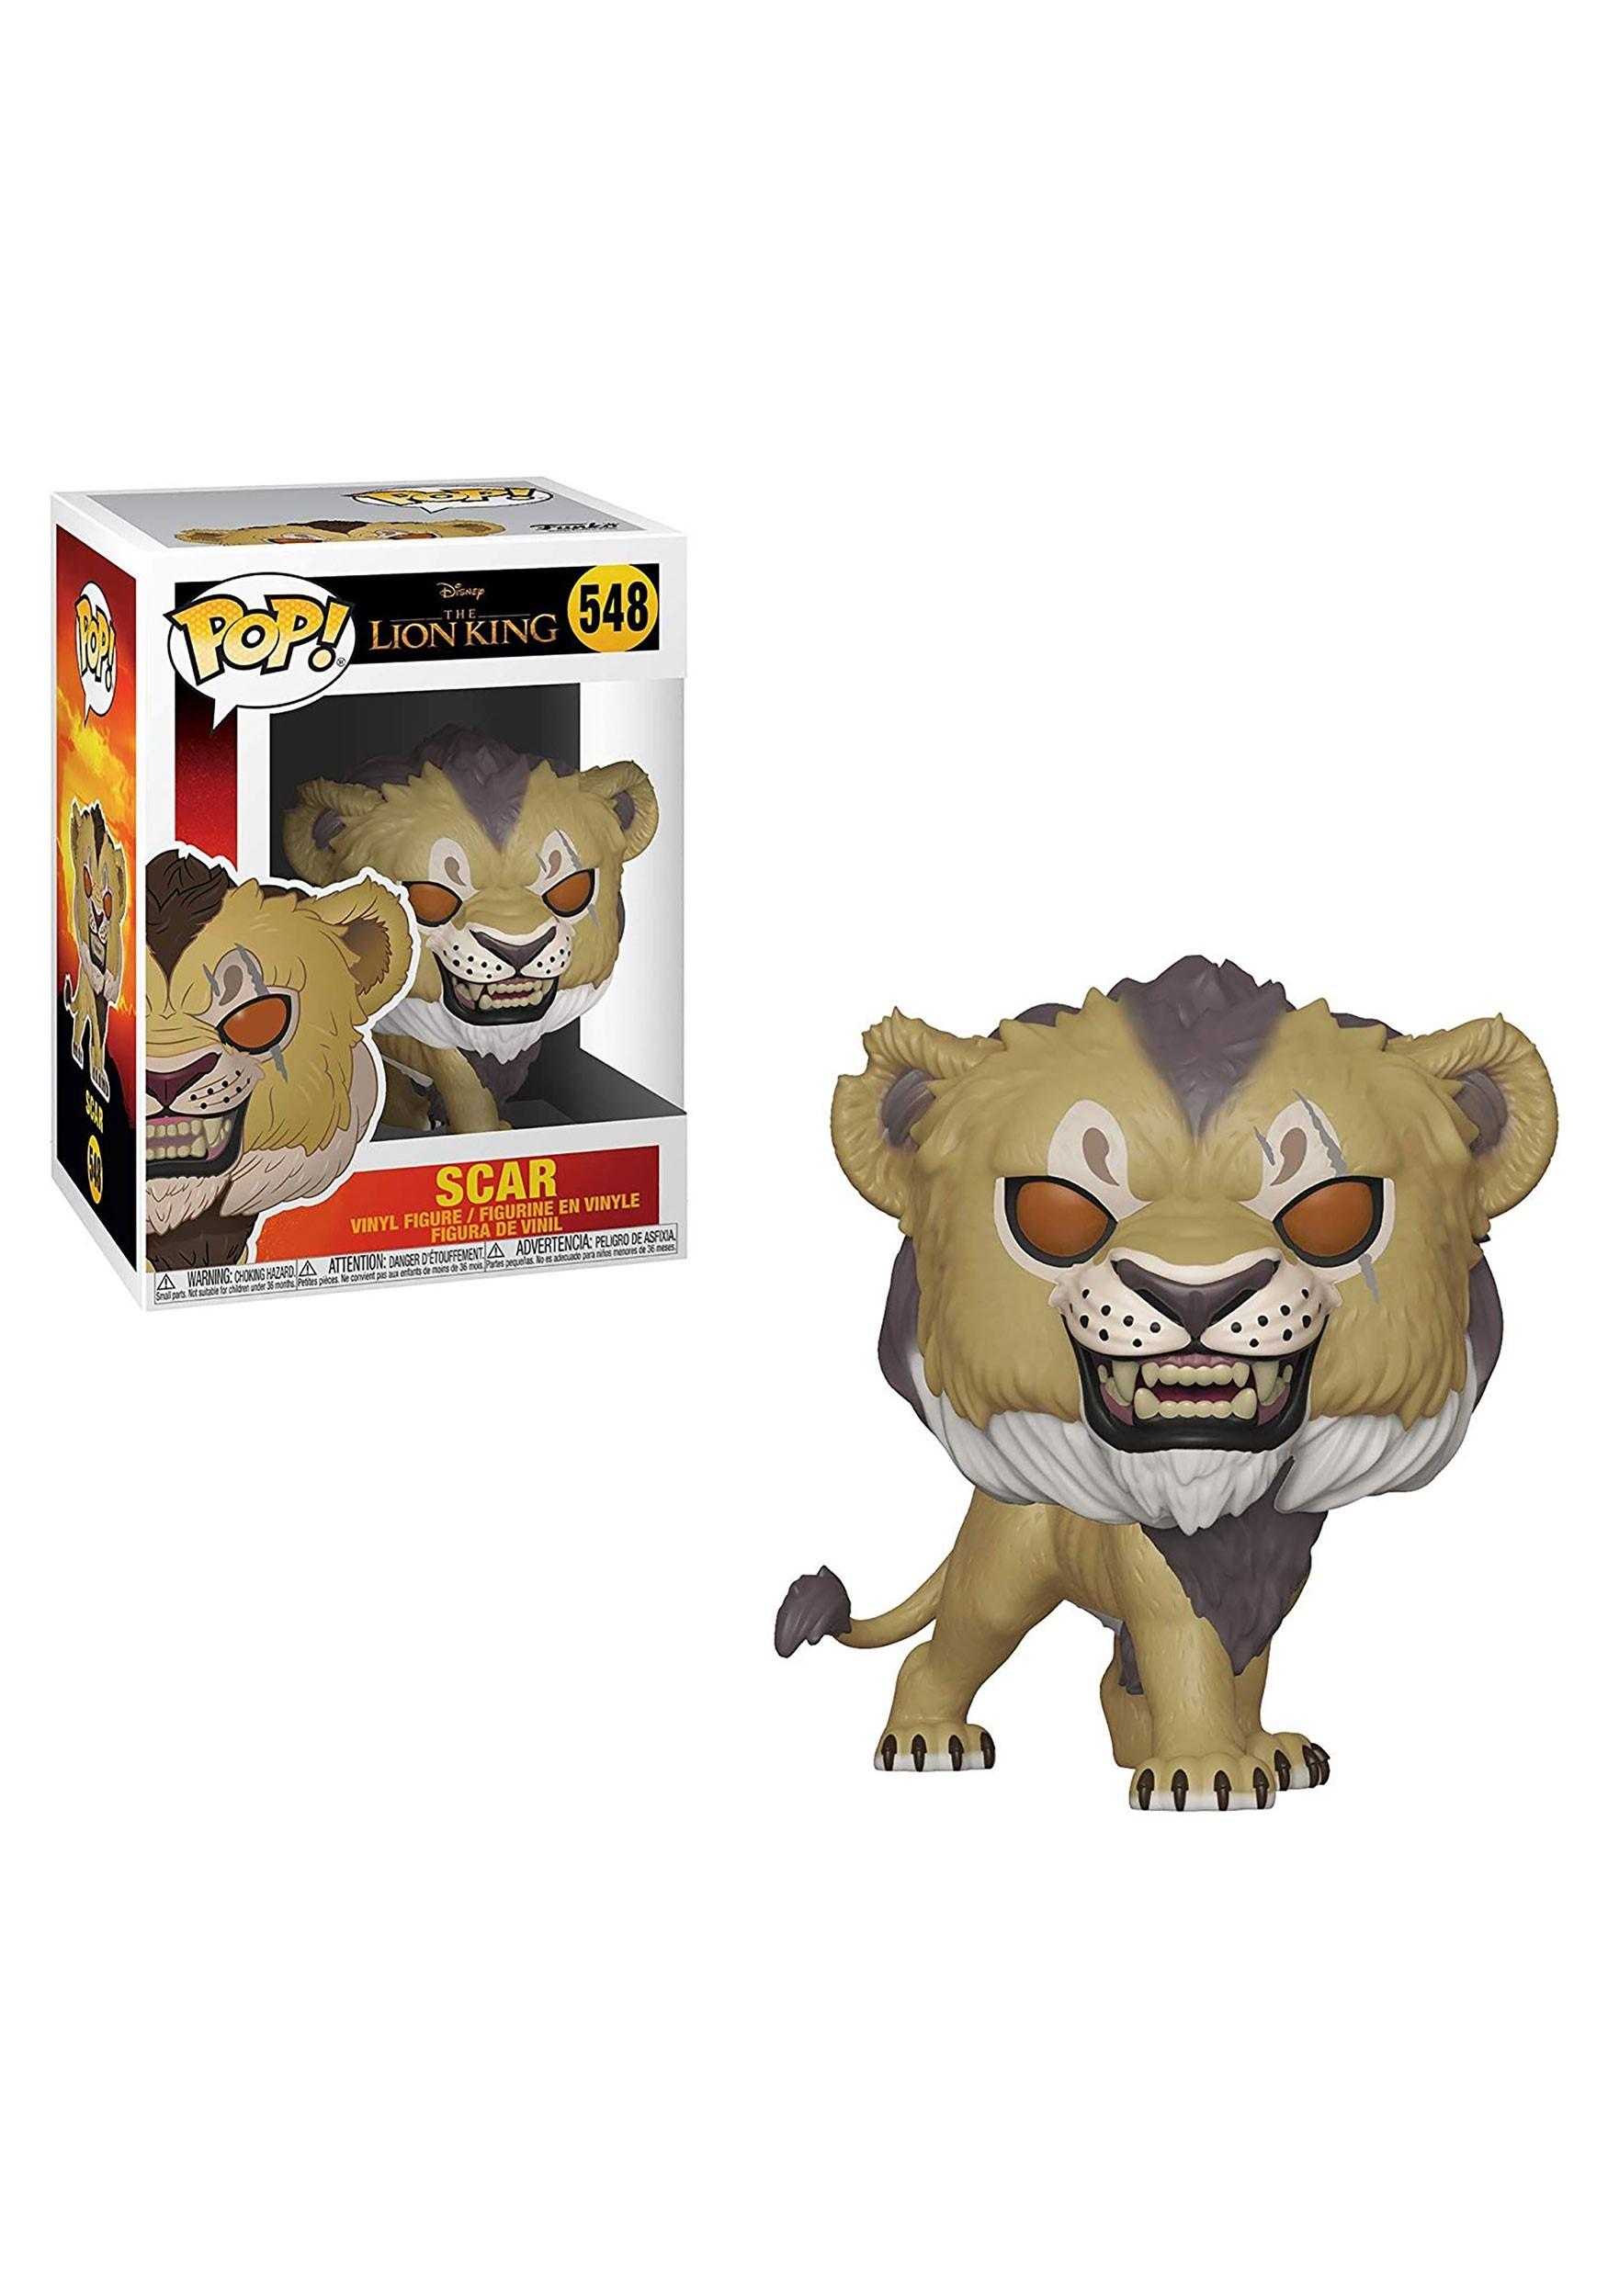 The Lion King Live Action Scar Pop Disney